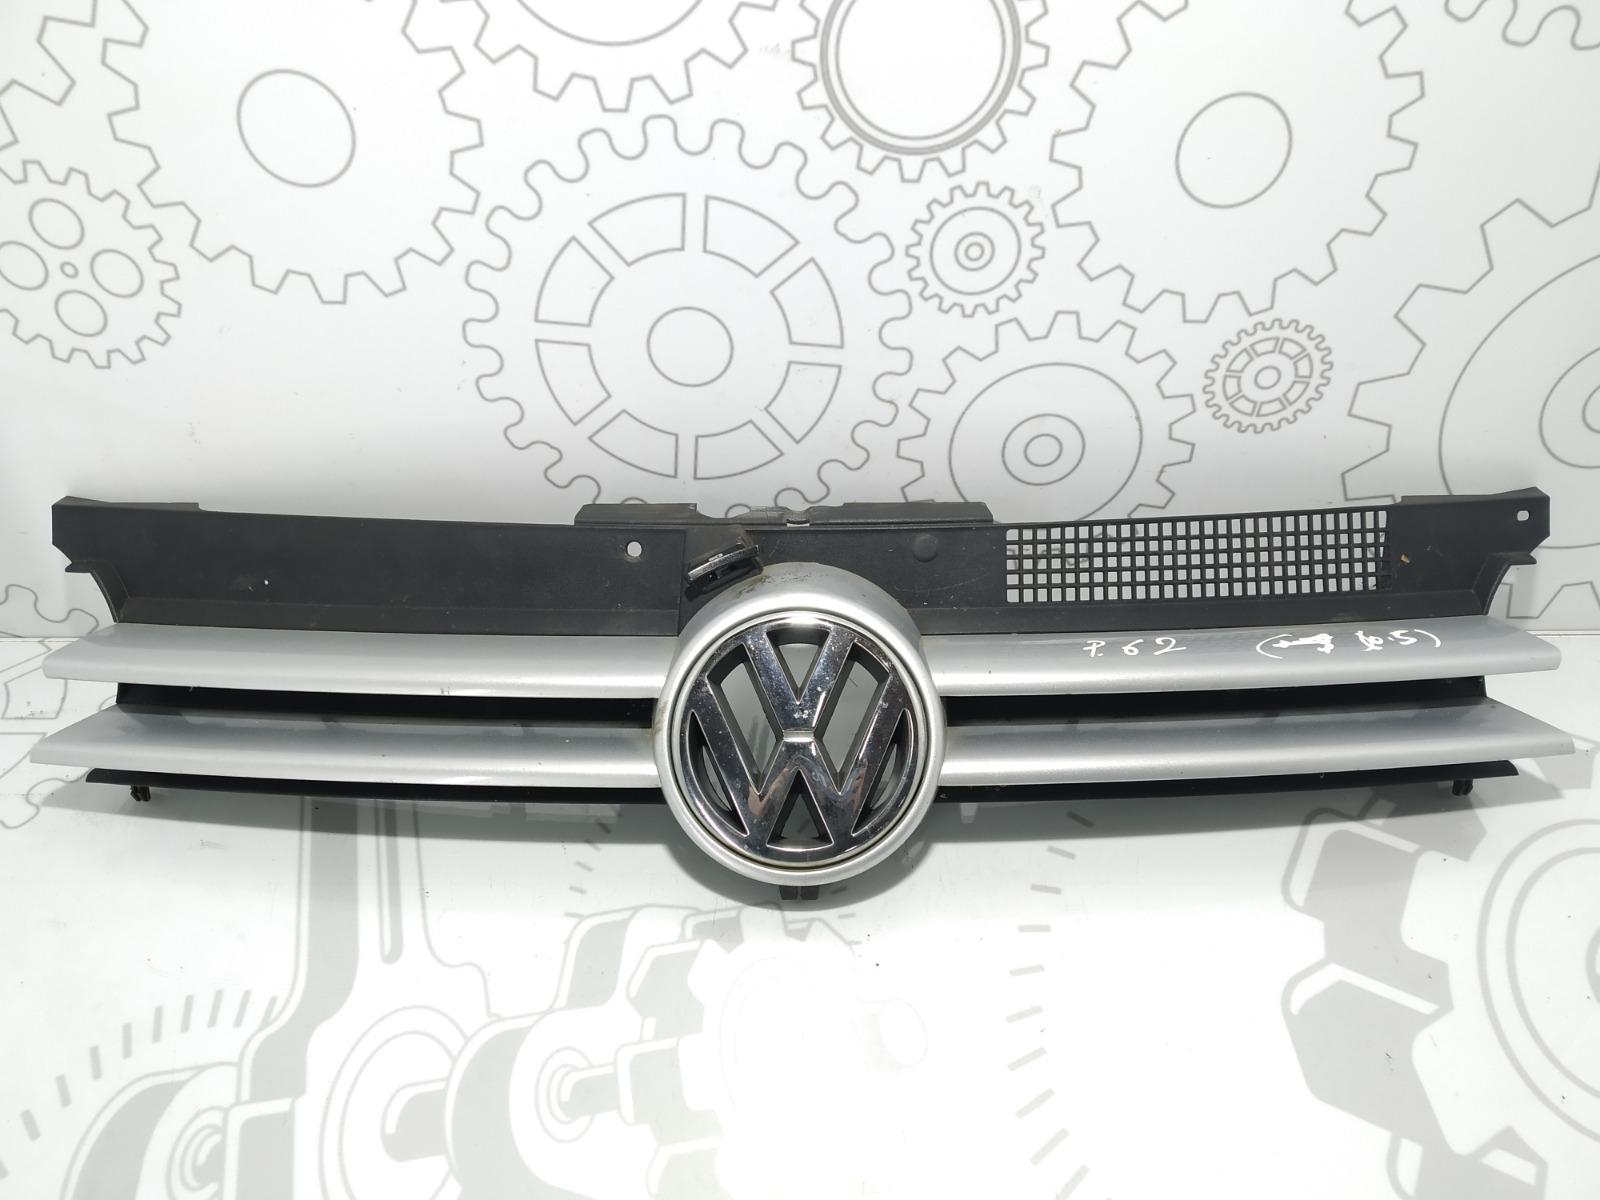 Решетка радиатора Volkswagen Golf 4 1.6 I 2002 (б/у)